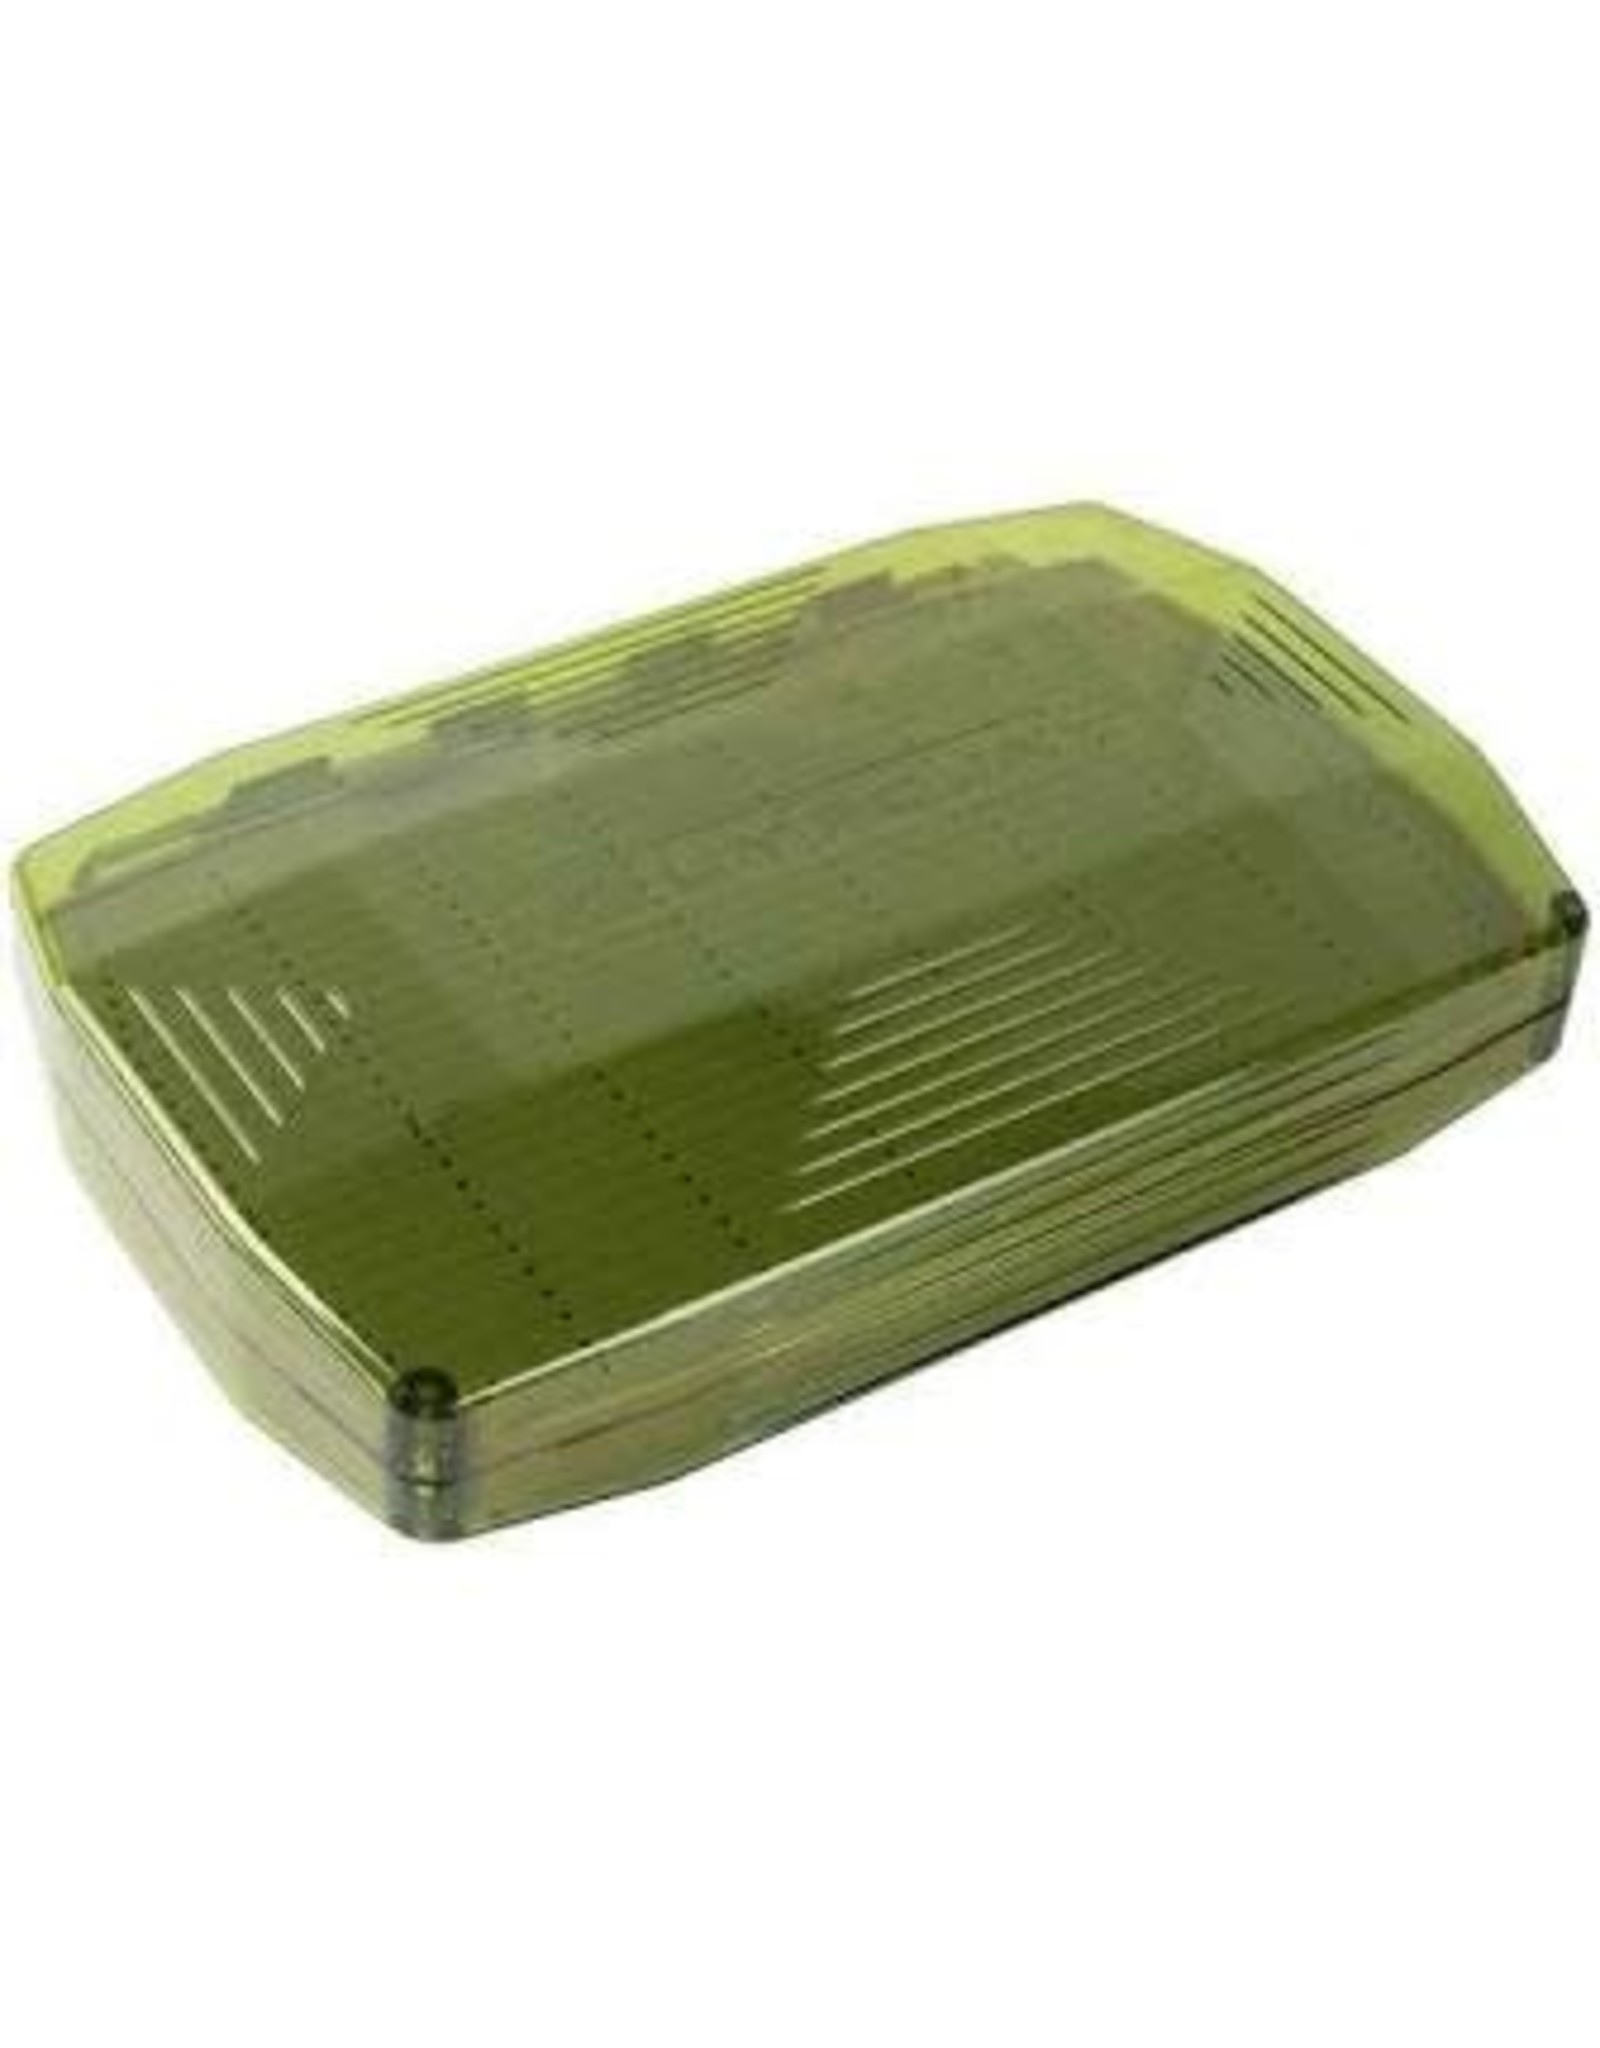 Umpqua Umpqua Payload Box Freshwater